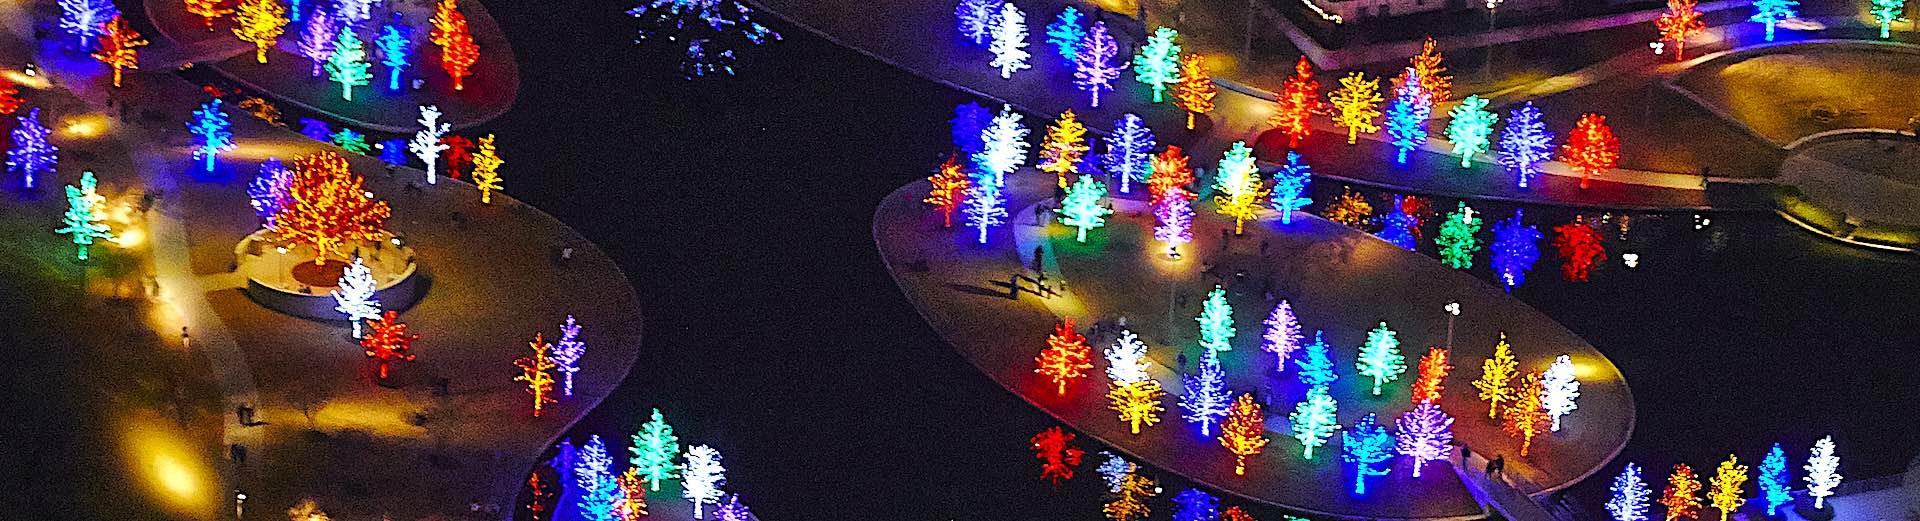 Vitruvian Lights Addison by Helicopter